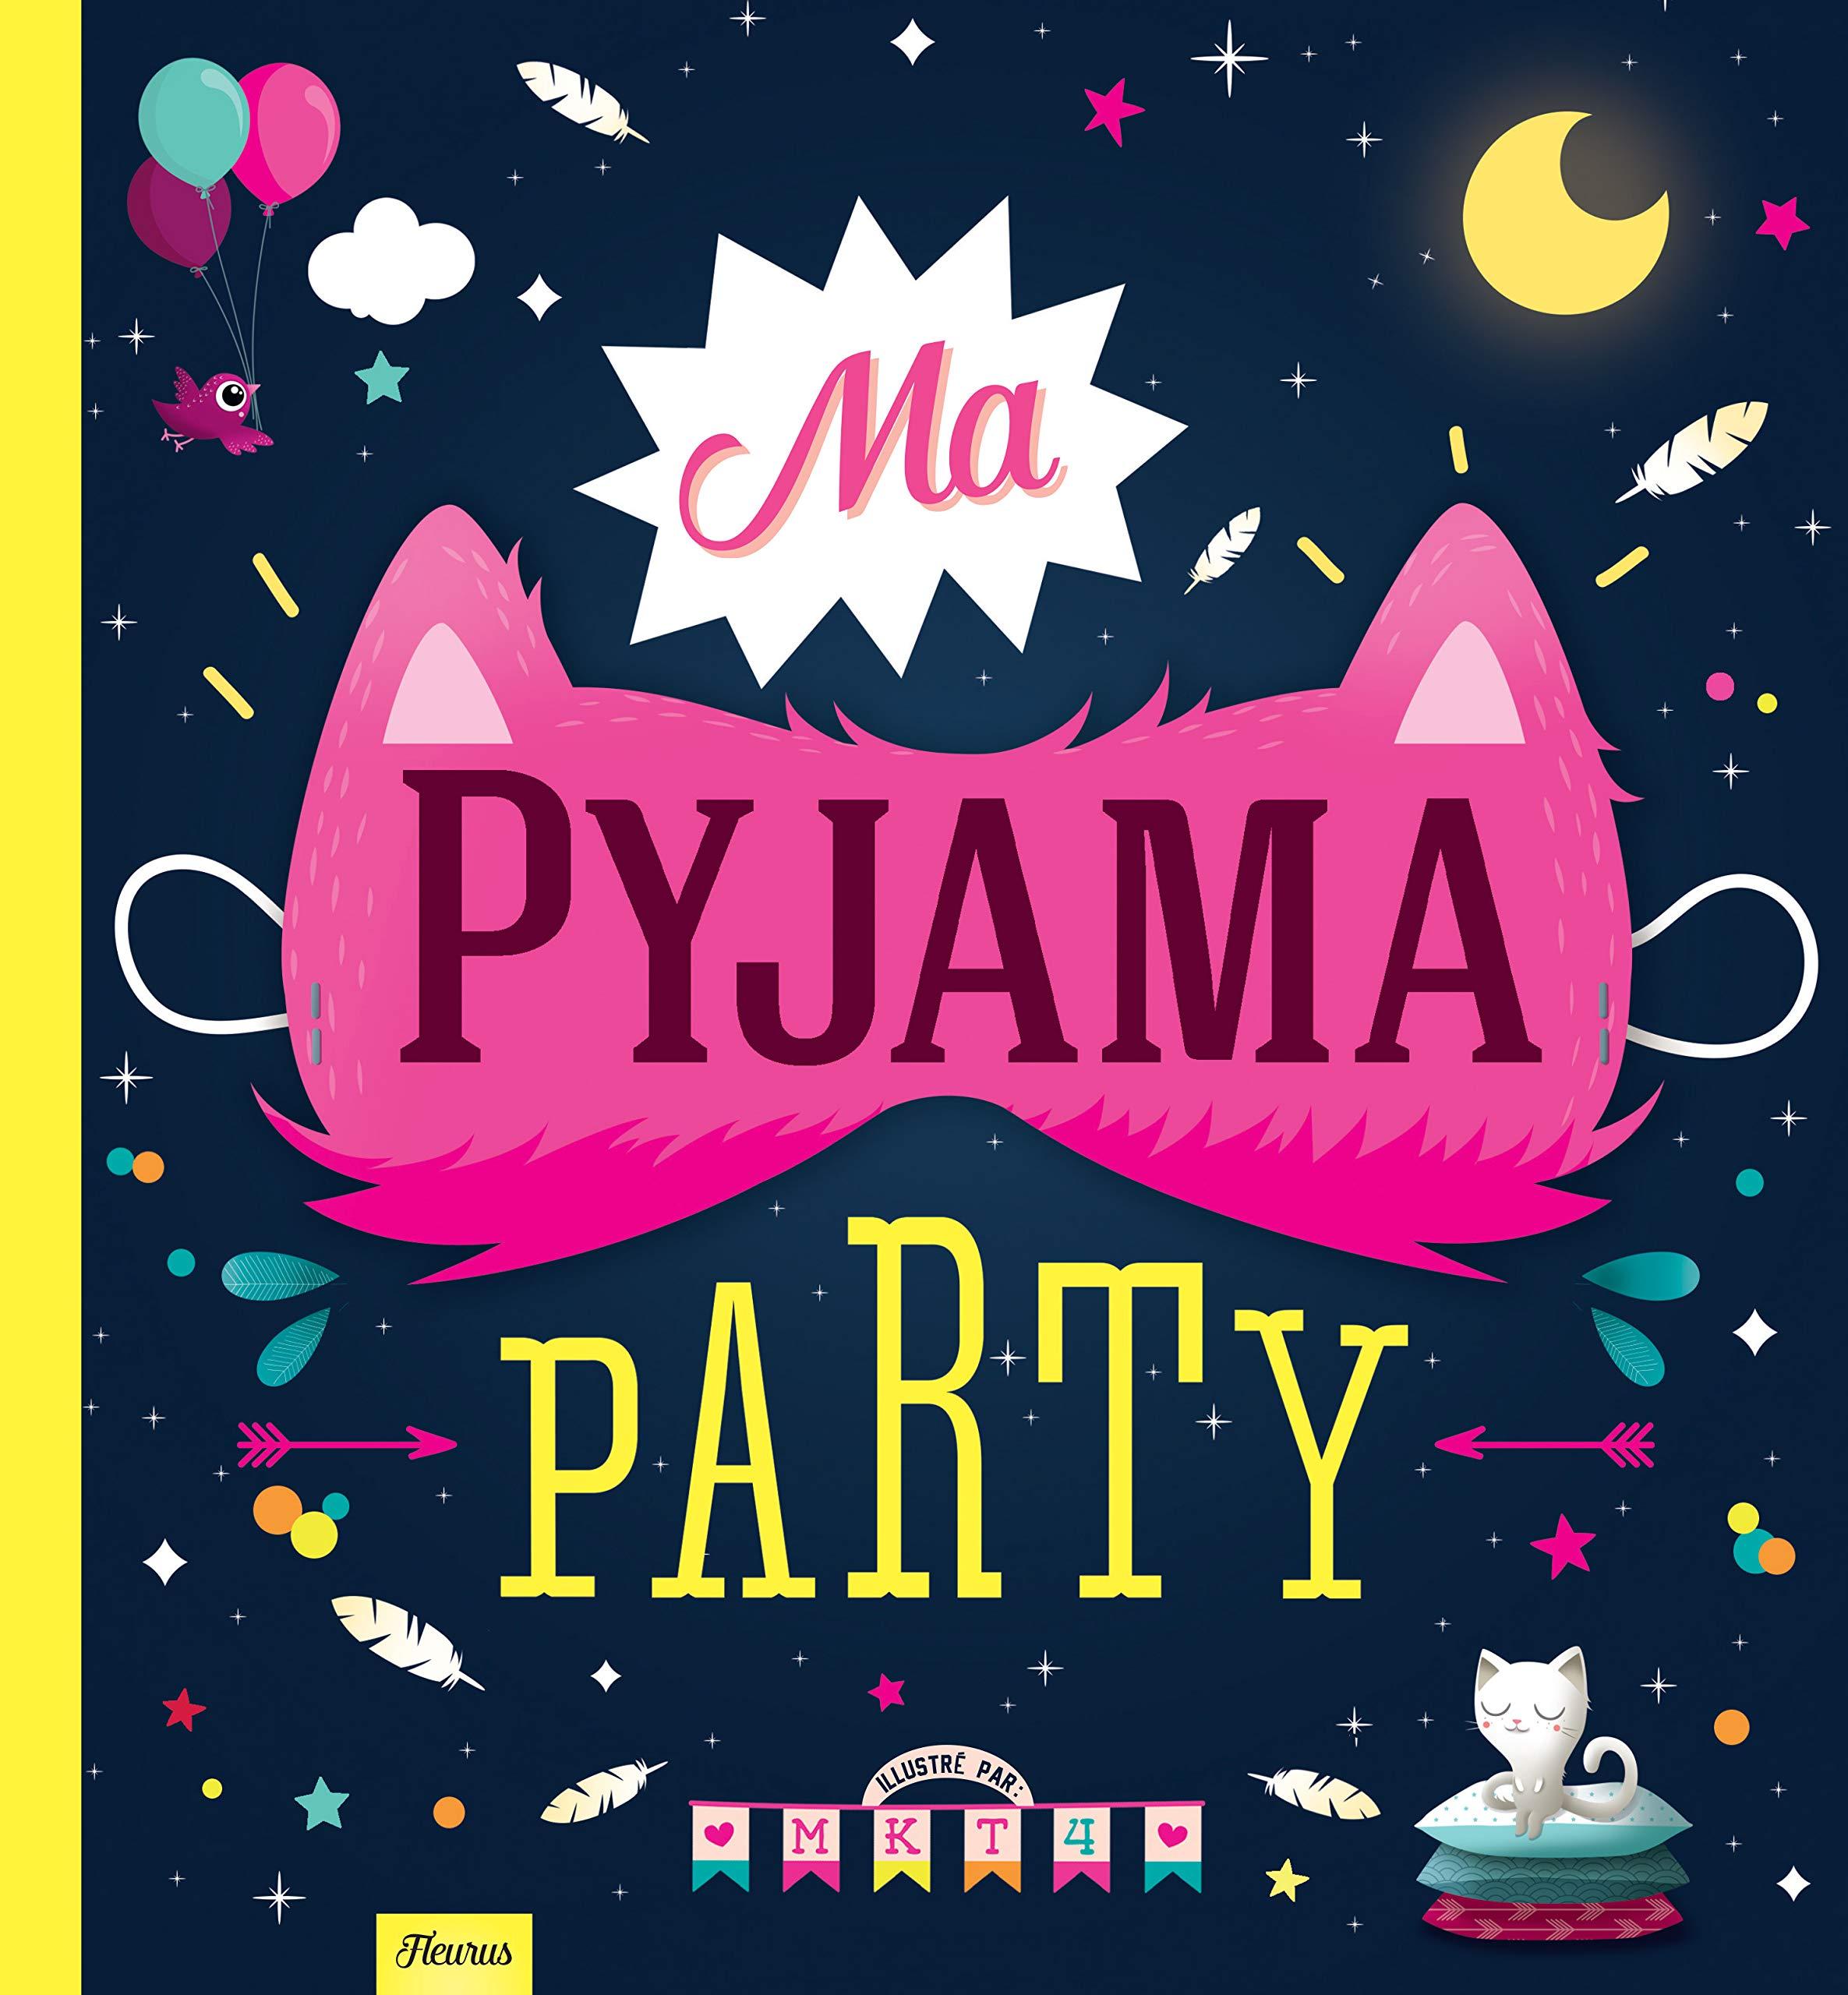 Ma pyjama party: Collectif: 9782215132455: Books - Amazon.ca